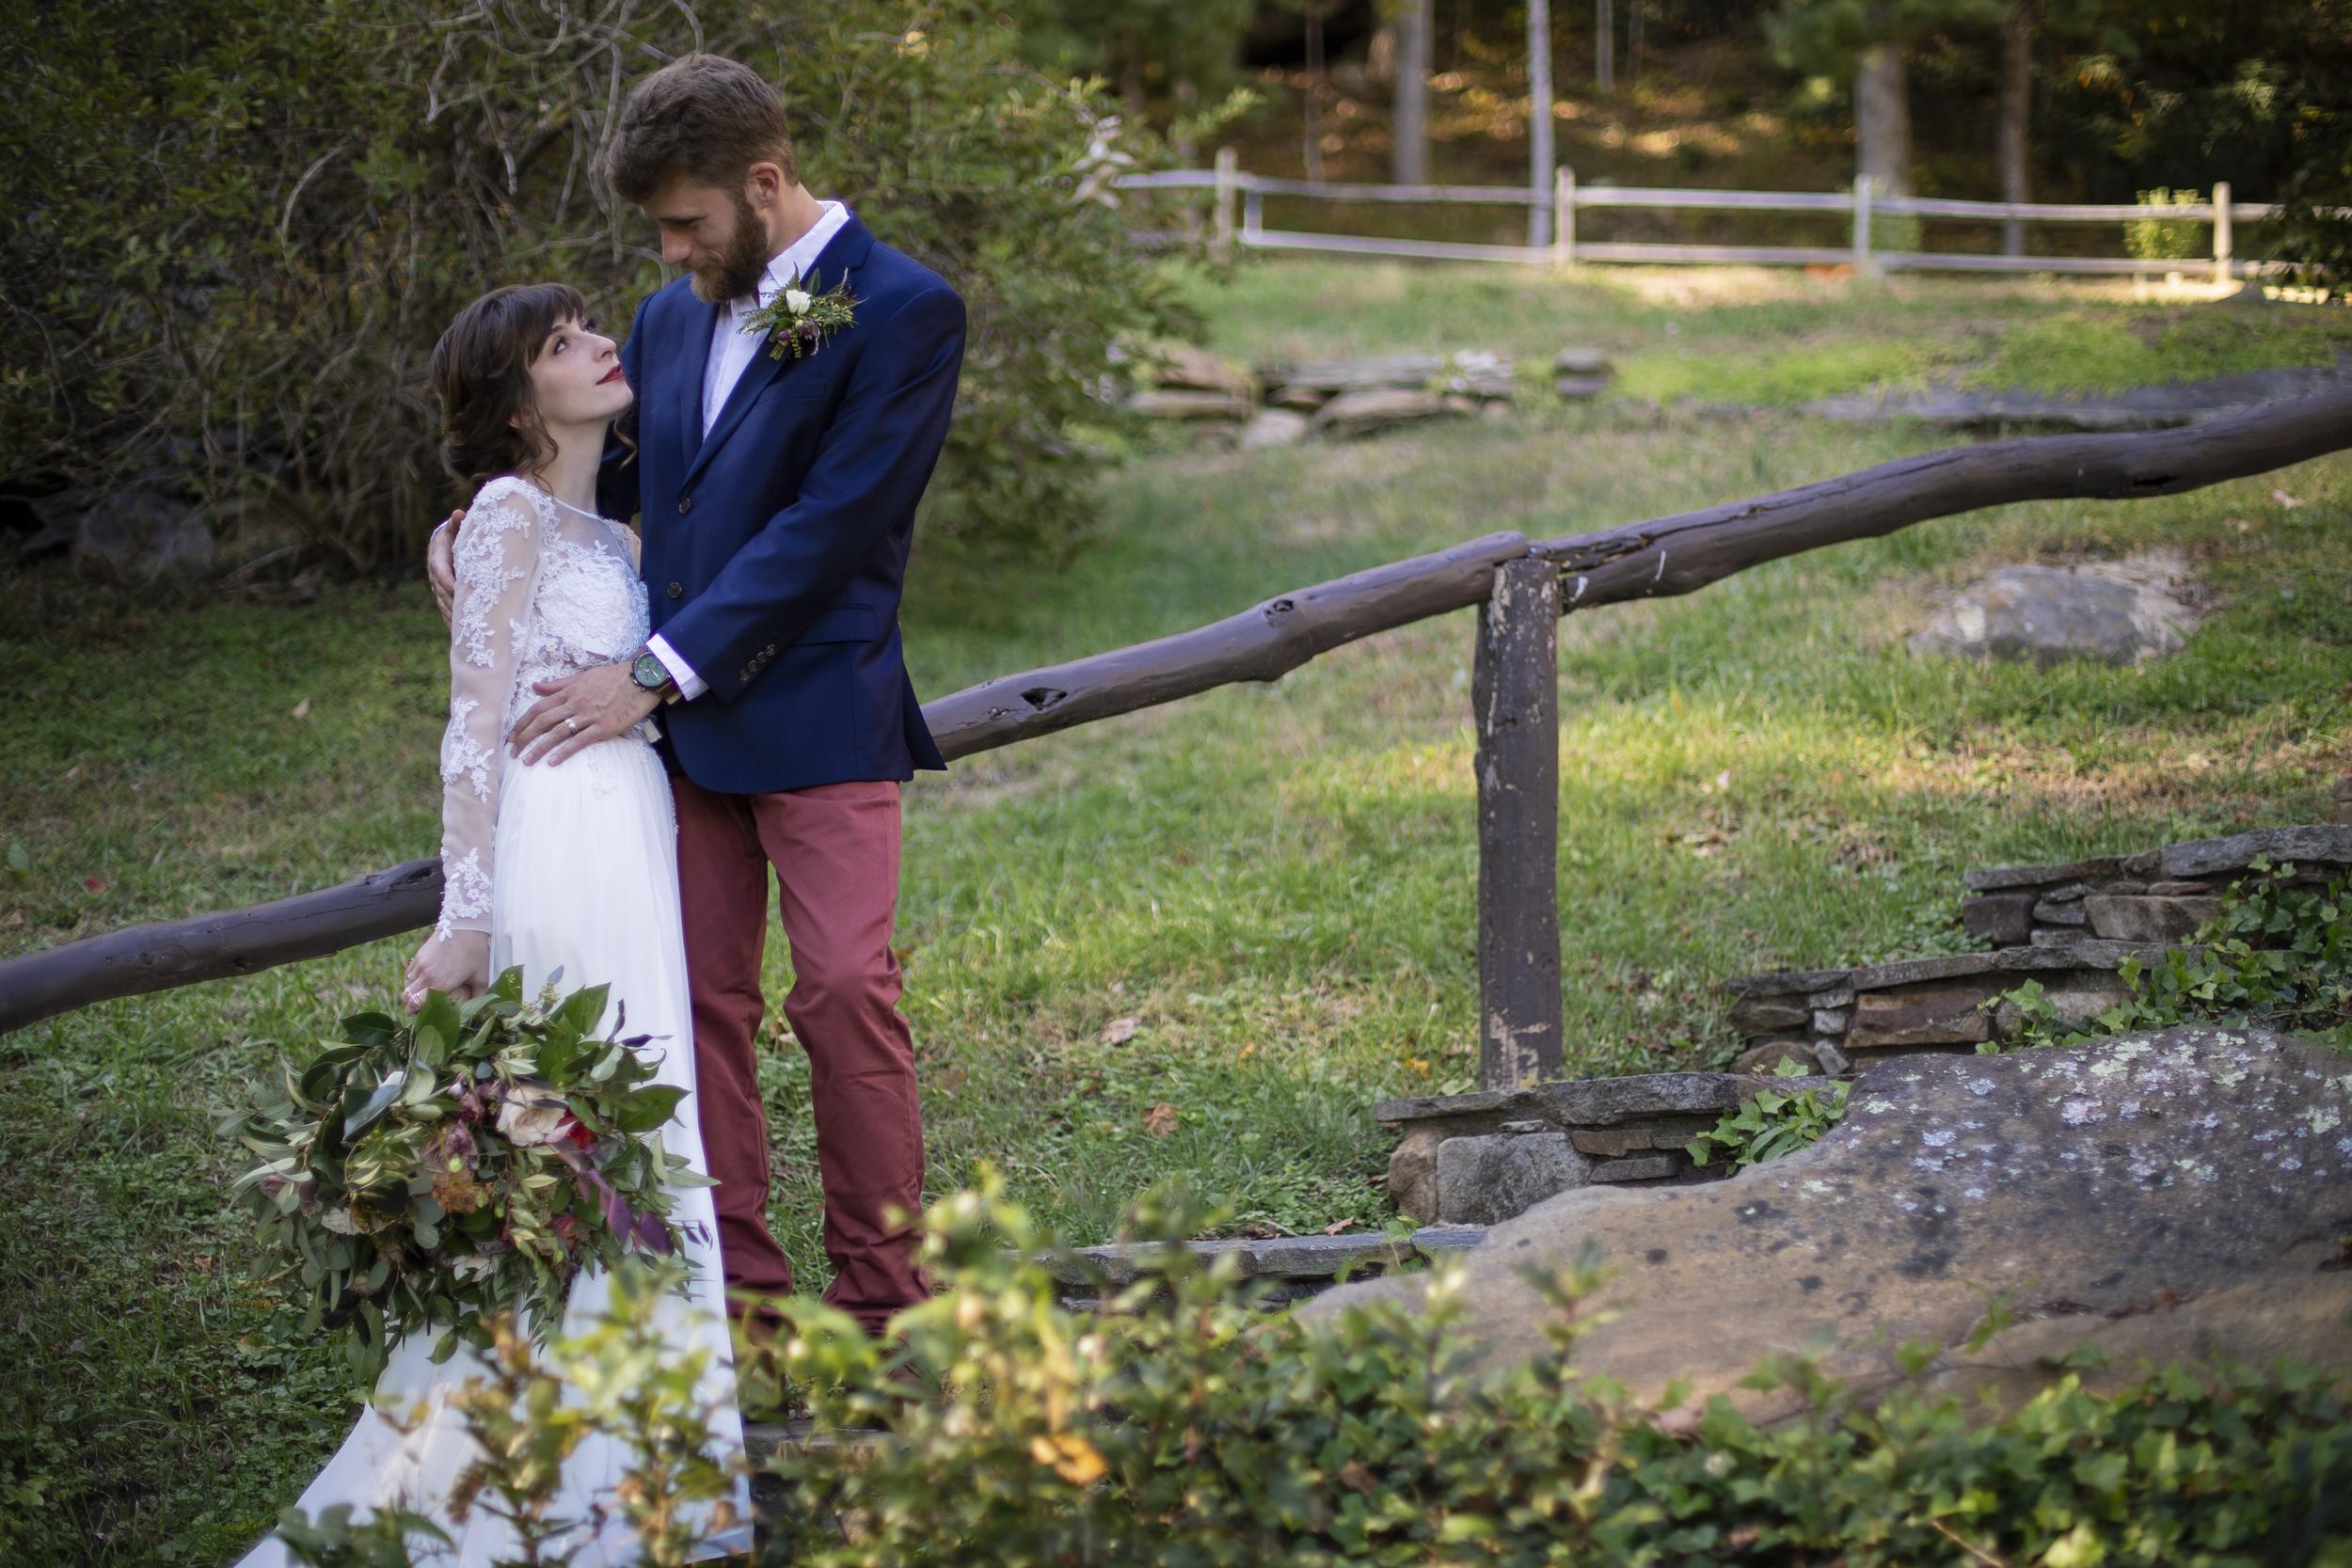 Laurel Falls Wedding October 2018_Allison and Josh__Lola Salon_Flora_Photo by Studio Misha Photography-62.jpg